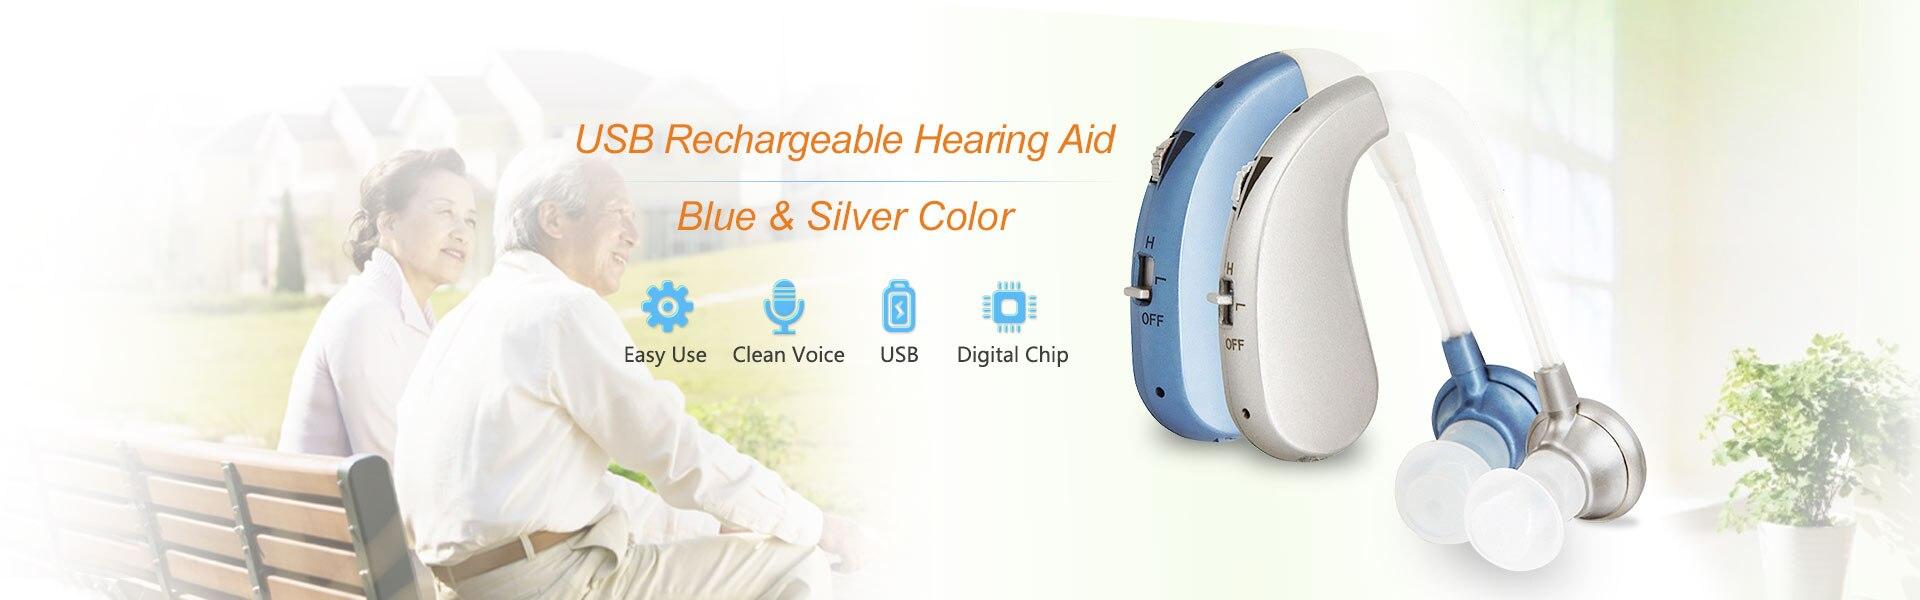 Laiwen Portable Meter Store Small Orders Online Hot Selling Aid Vhp221 Productschina Bte Digital Hearing Amplifier Oplaadbare Gehoorapparaat 2018 New Rechargeable Mini